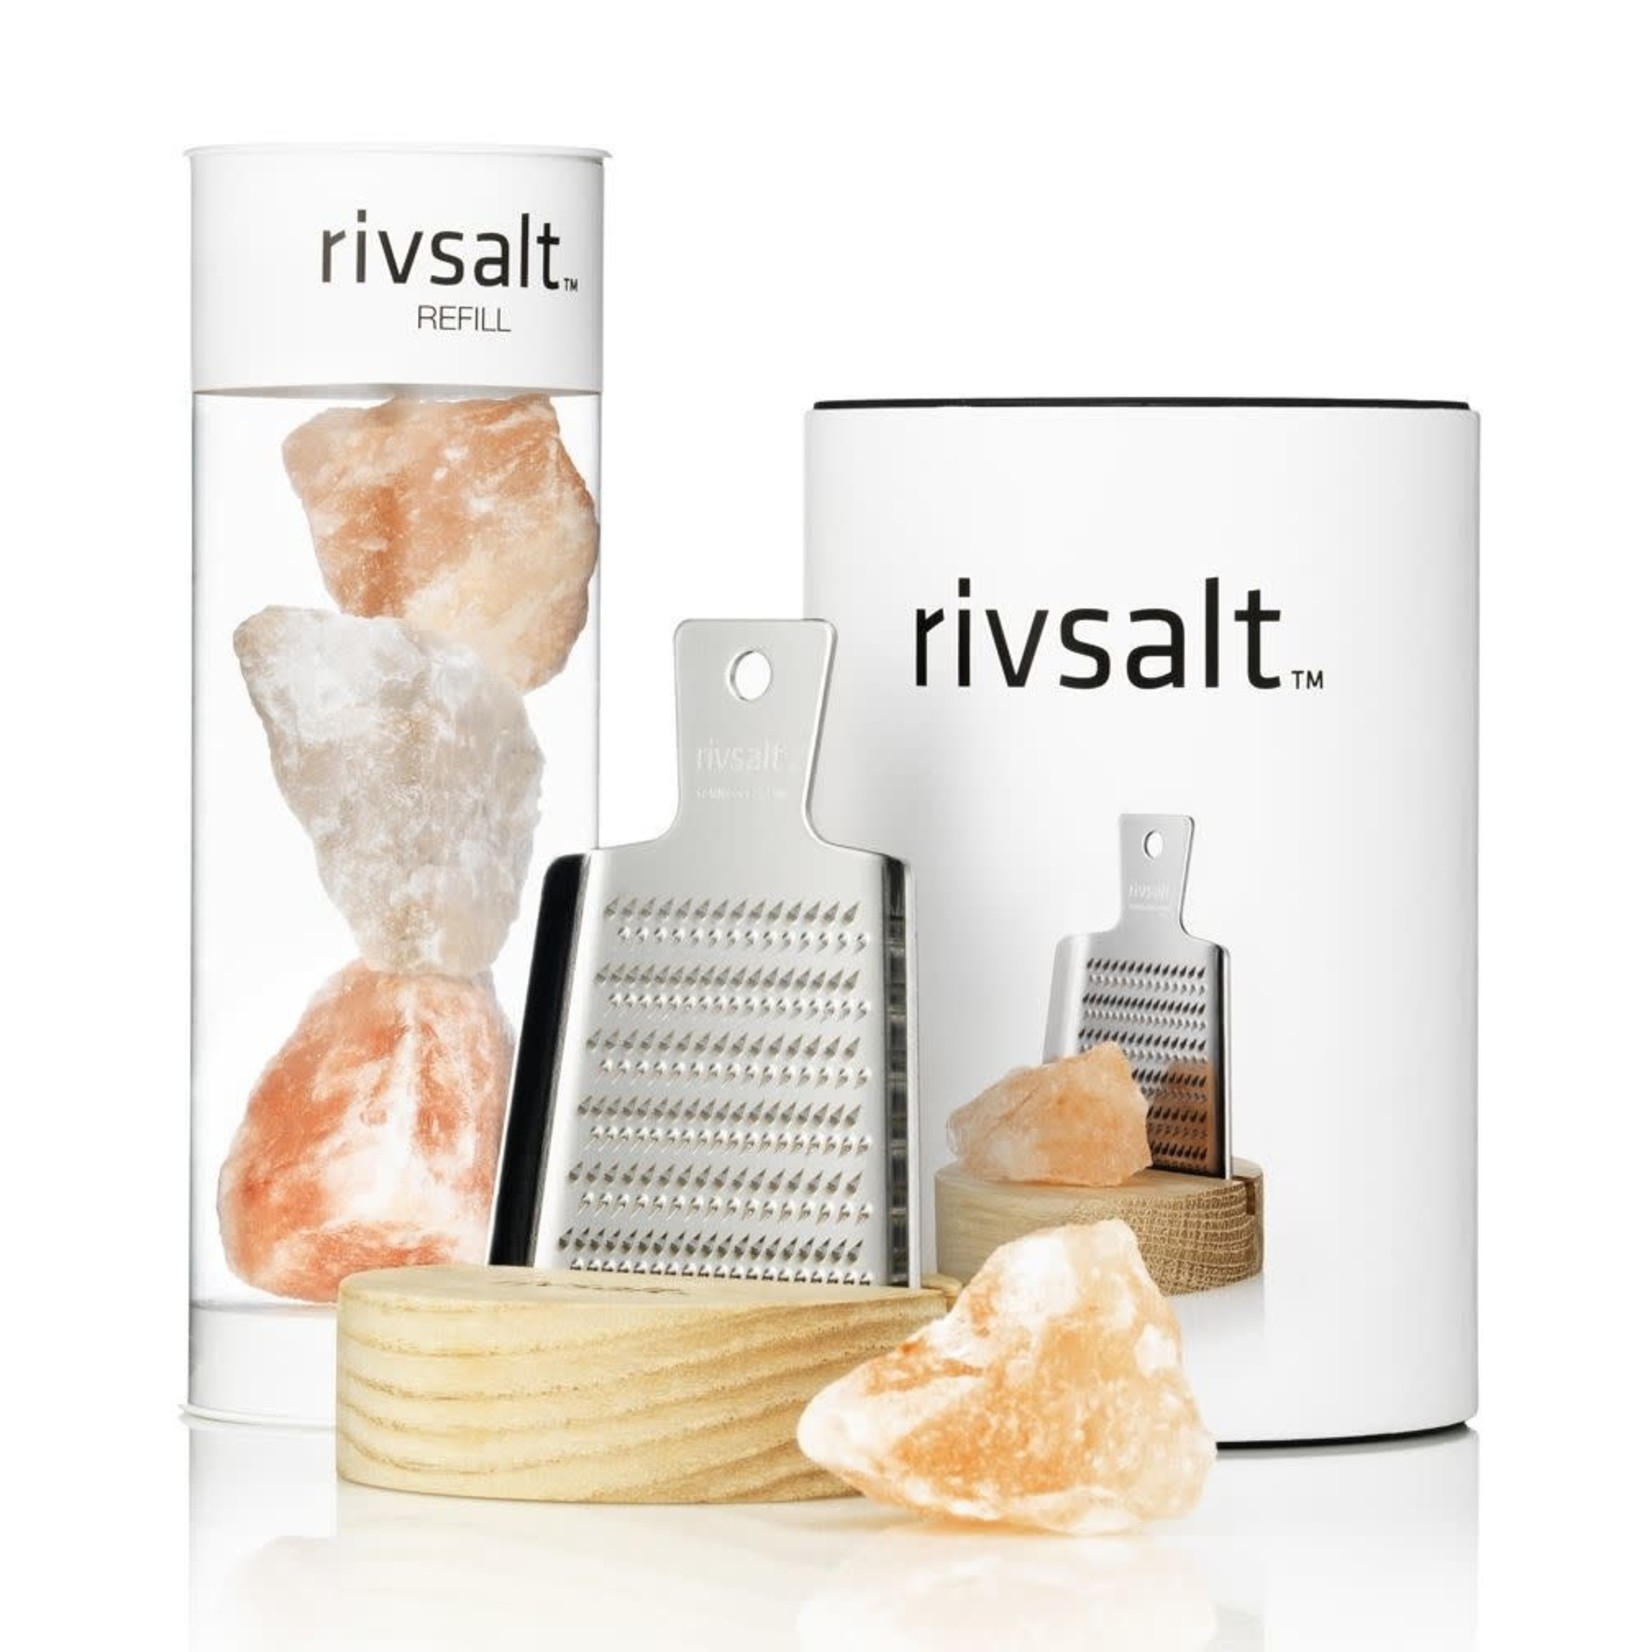 Rivsalt Rivsalt the original 40 gram